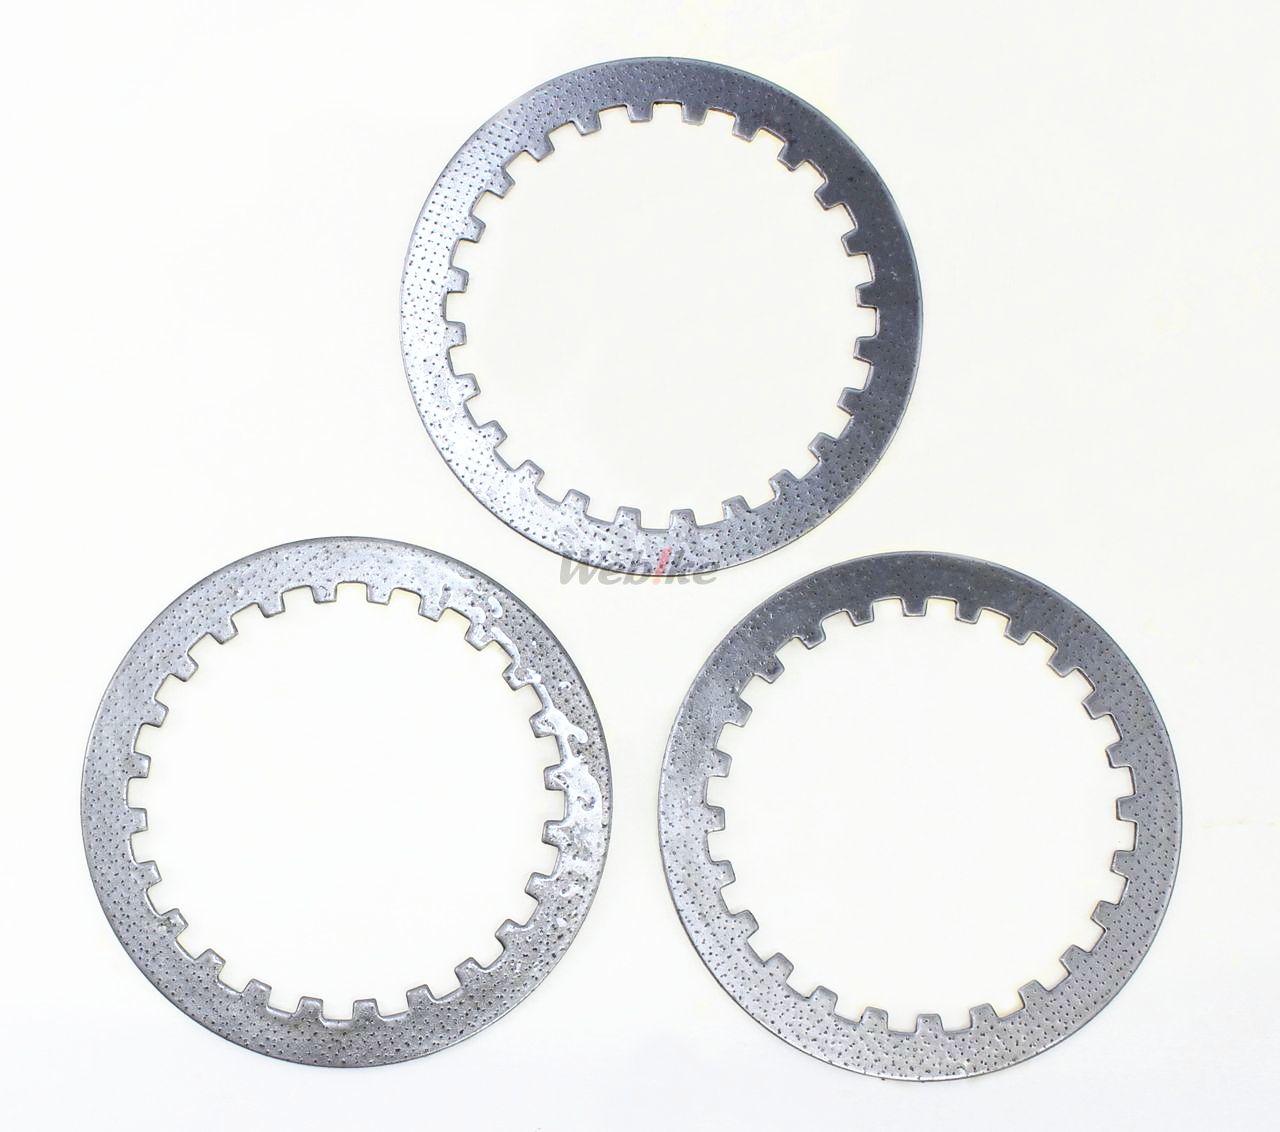 【SHIFT UP】4件式強化離合器完整套件 - 「Webike-摩托百貨」